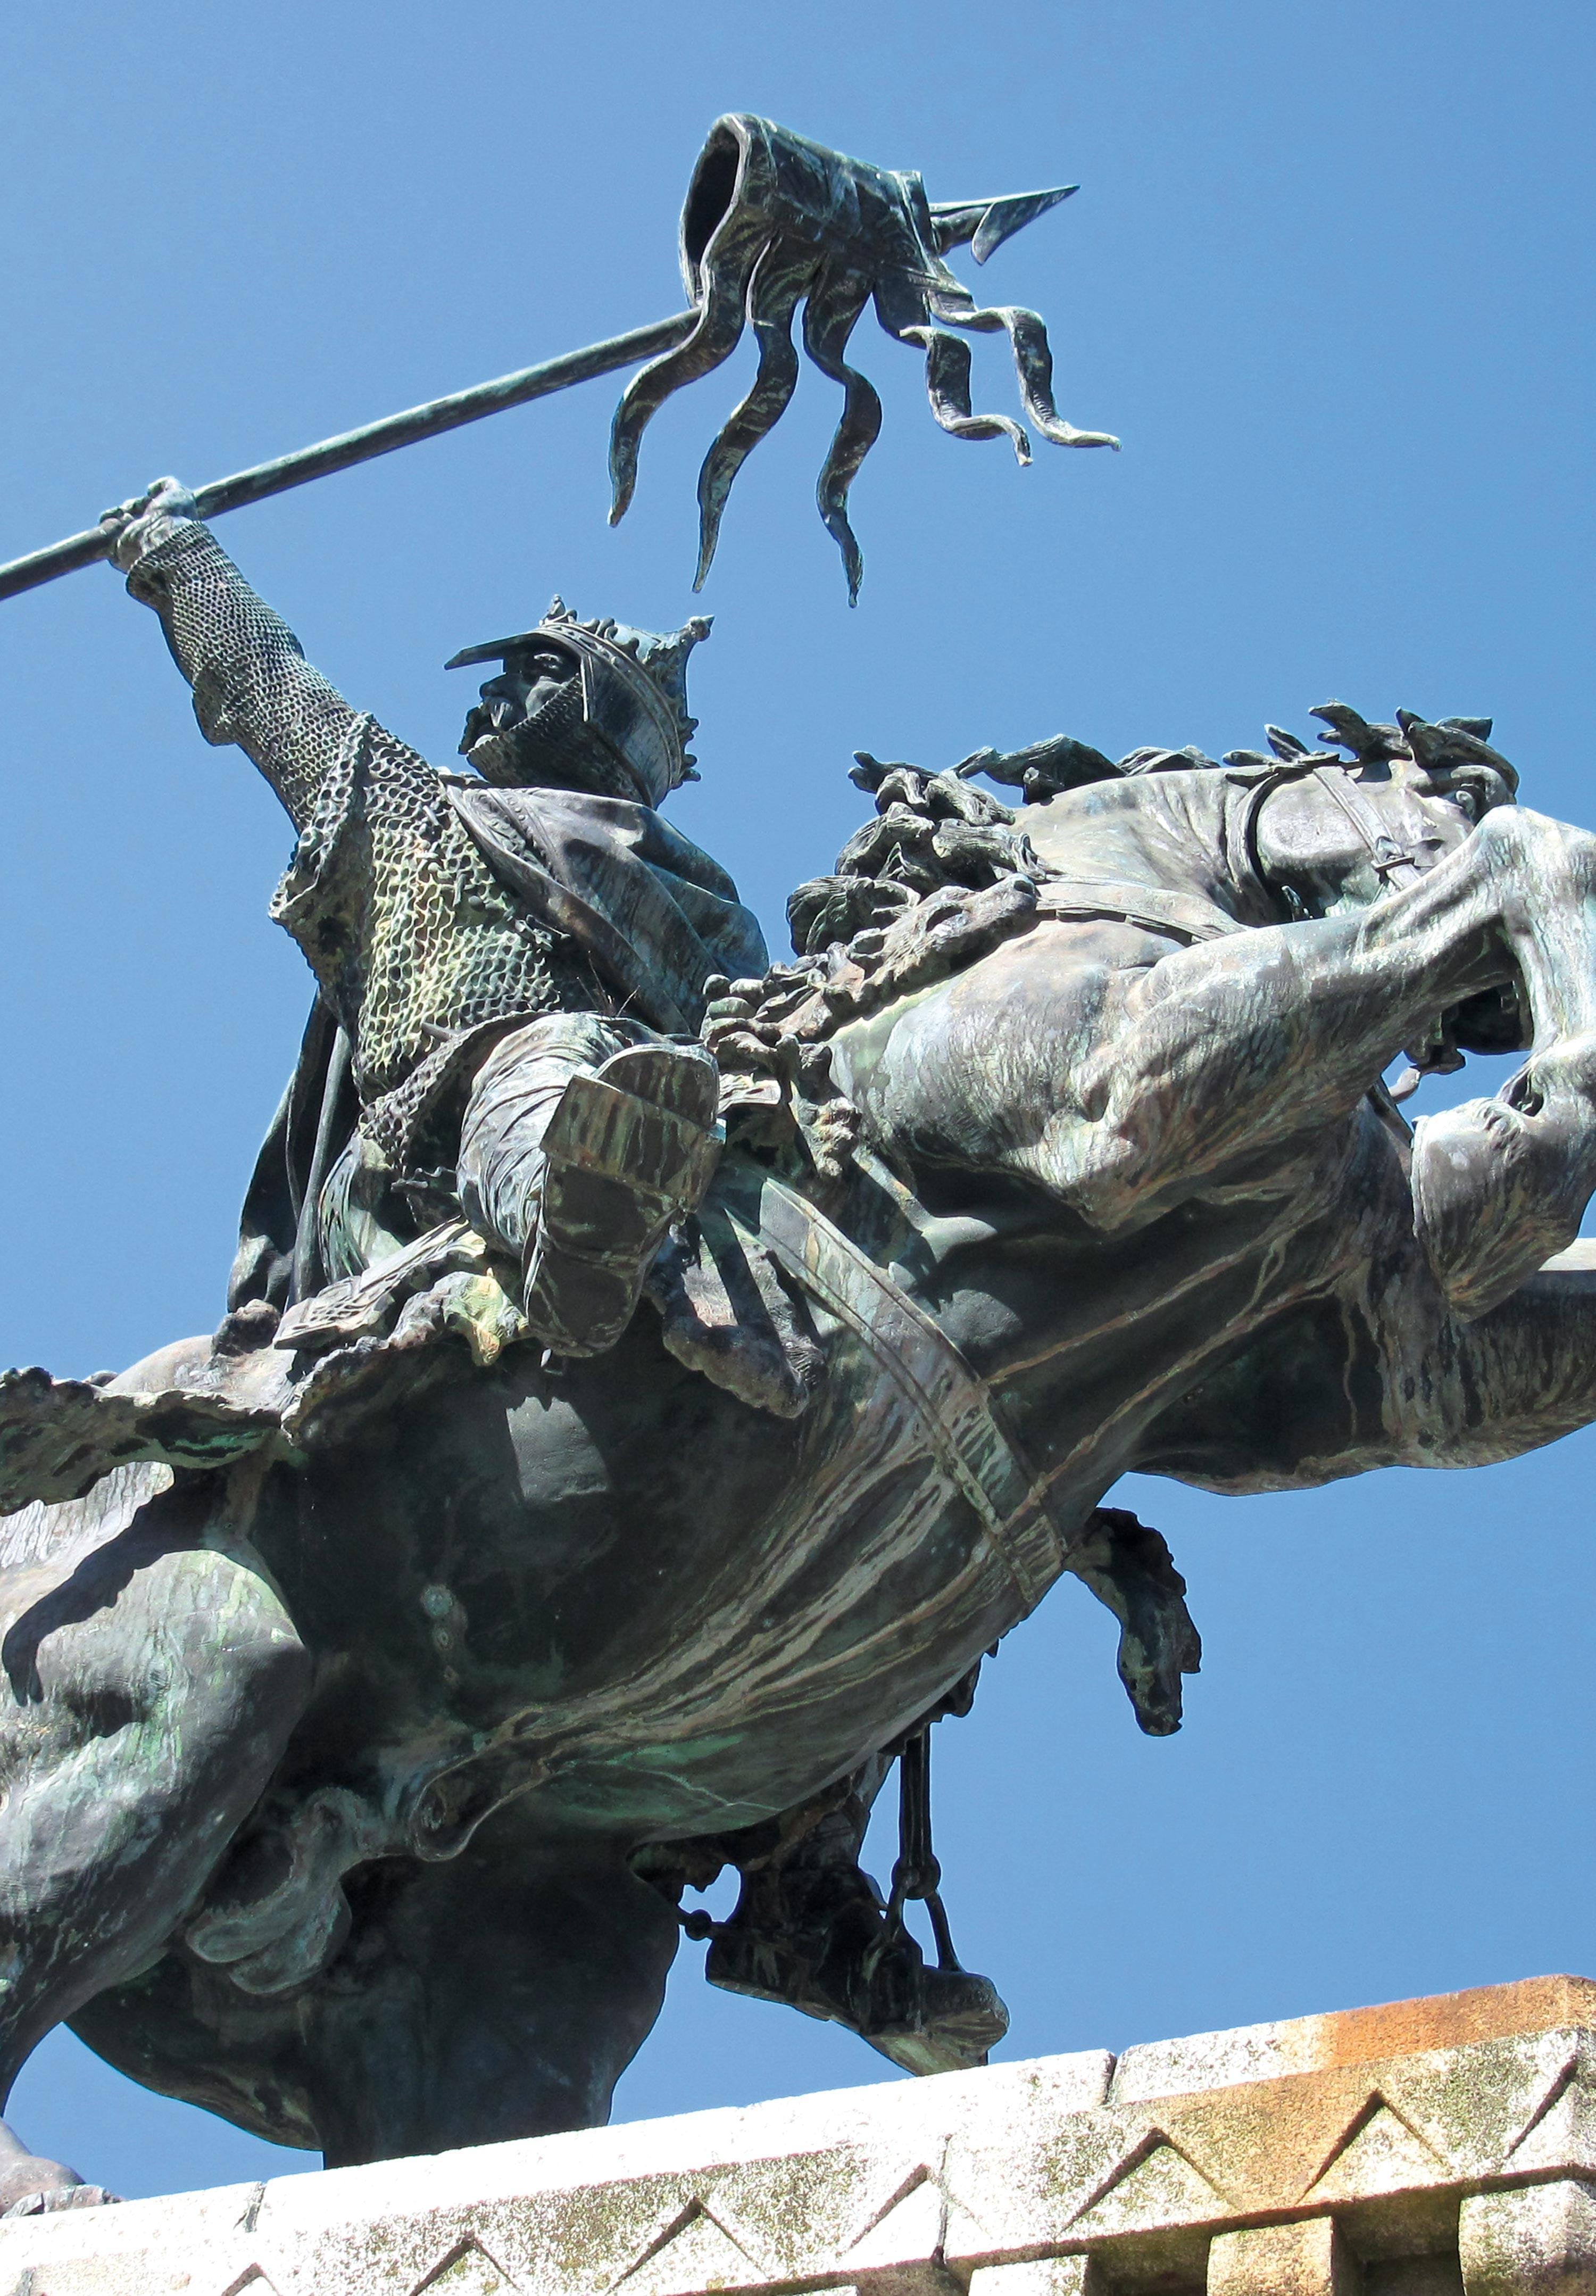 Equestrian statue of William the Conqueror